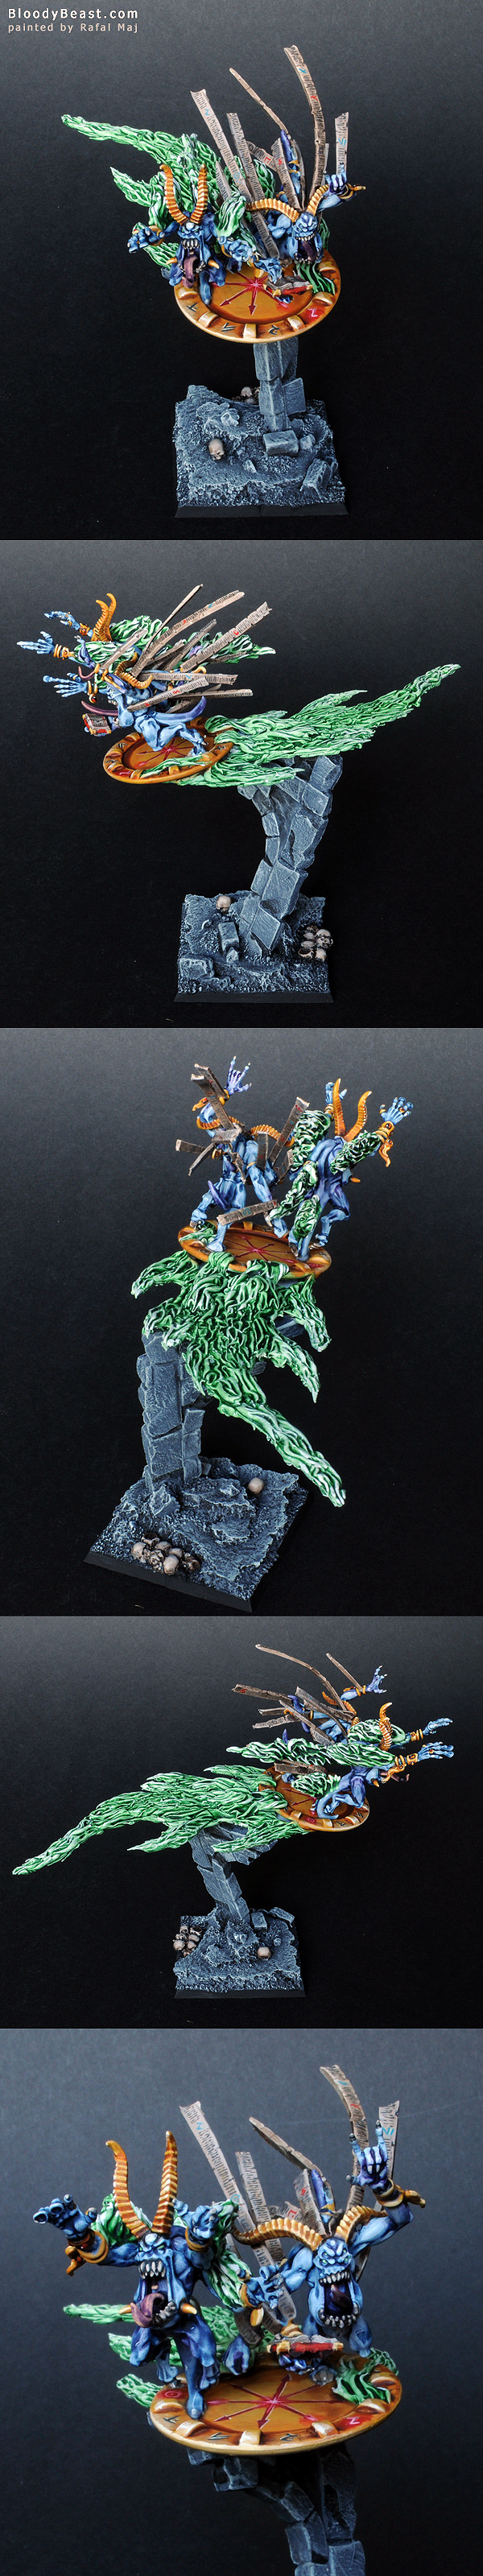 Blue Scribes of Tzeentch painted by Rafal Maj (BloodyBeast.com)